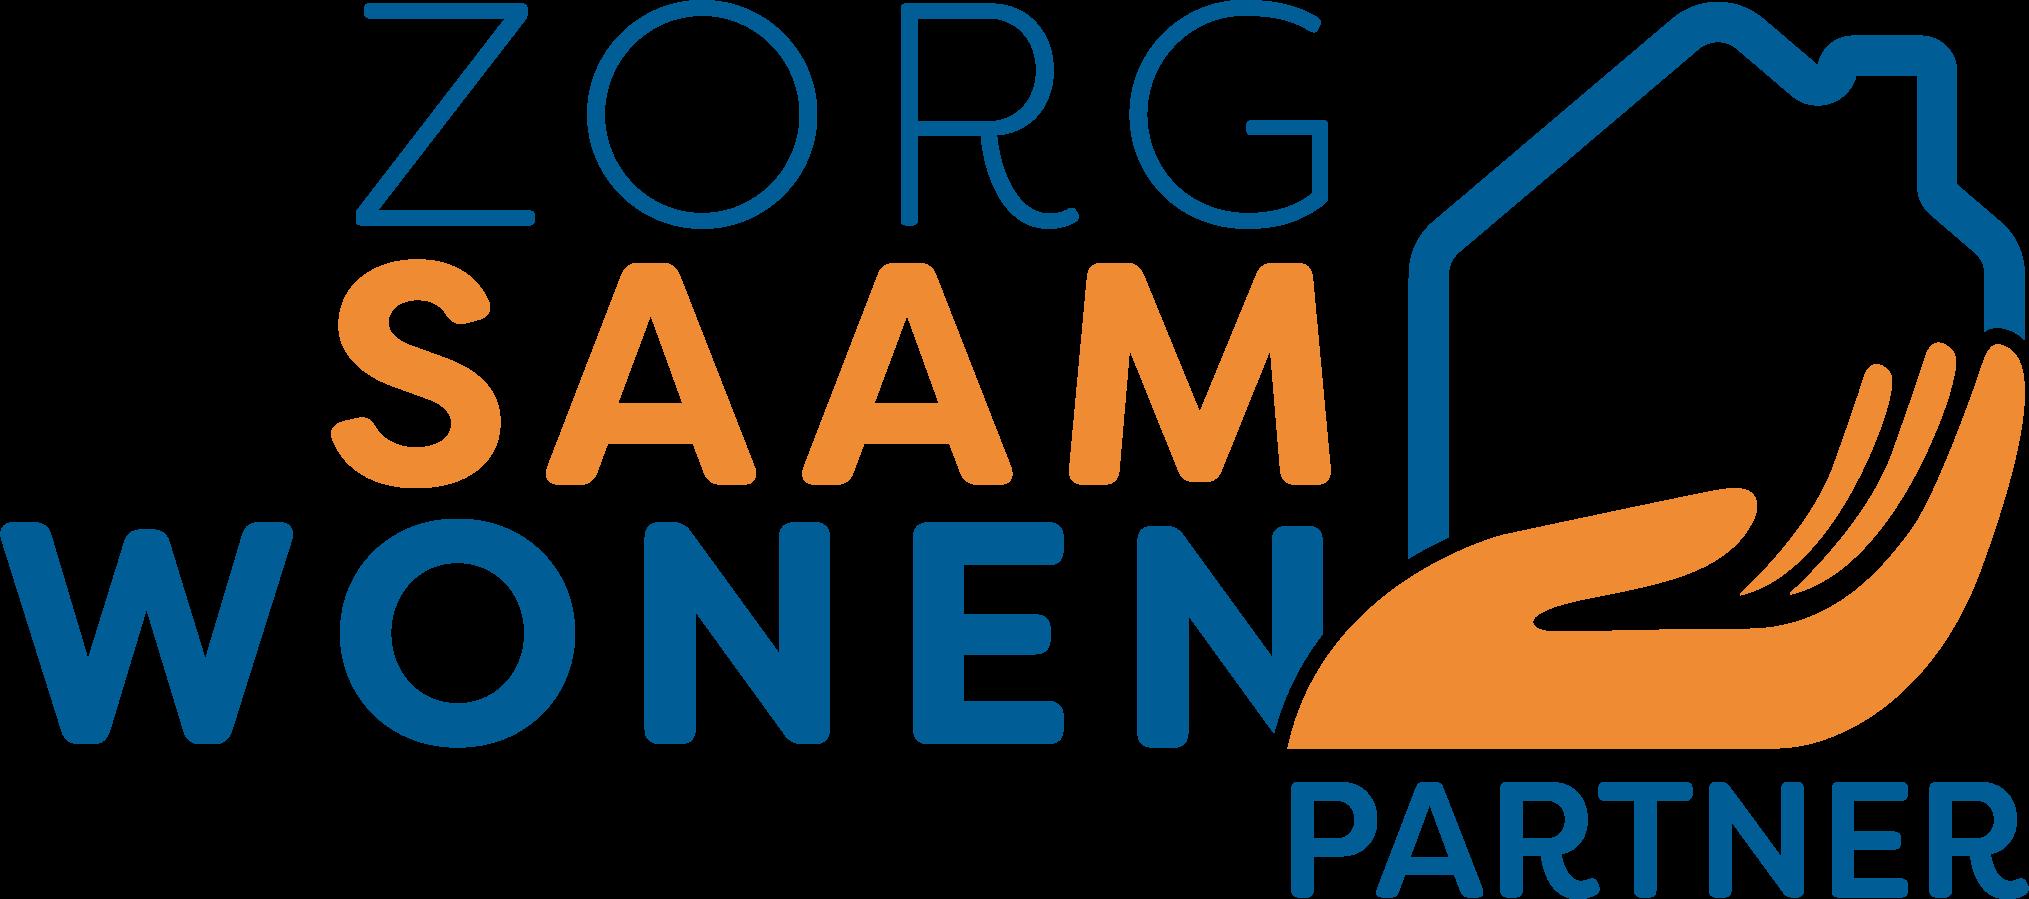 ZorgSaamWonen partner logo